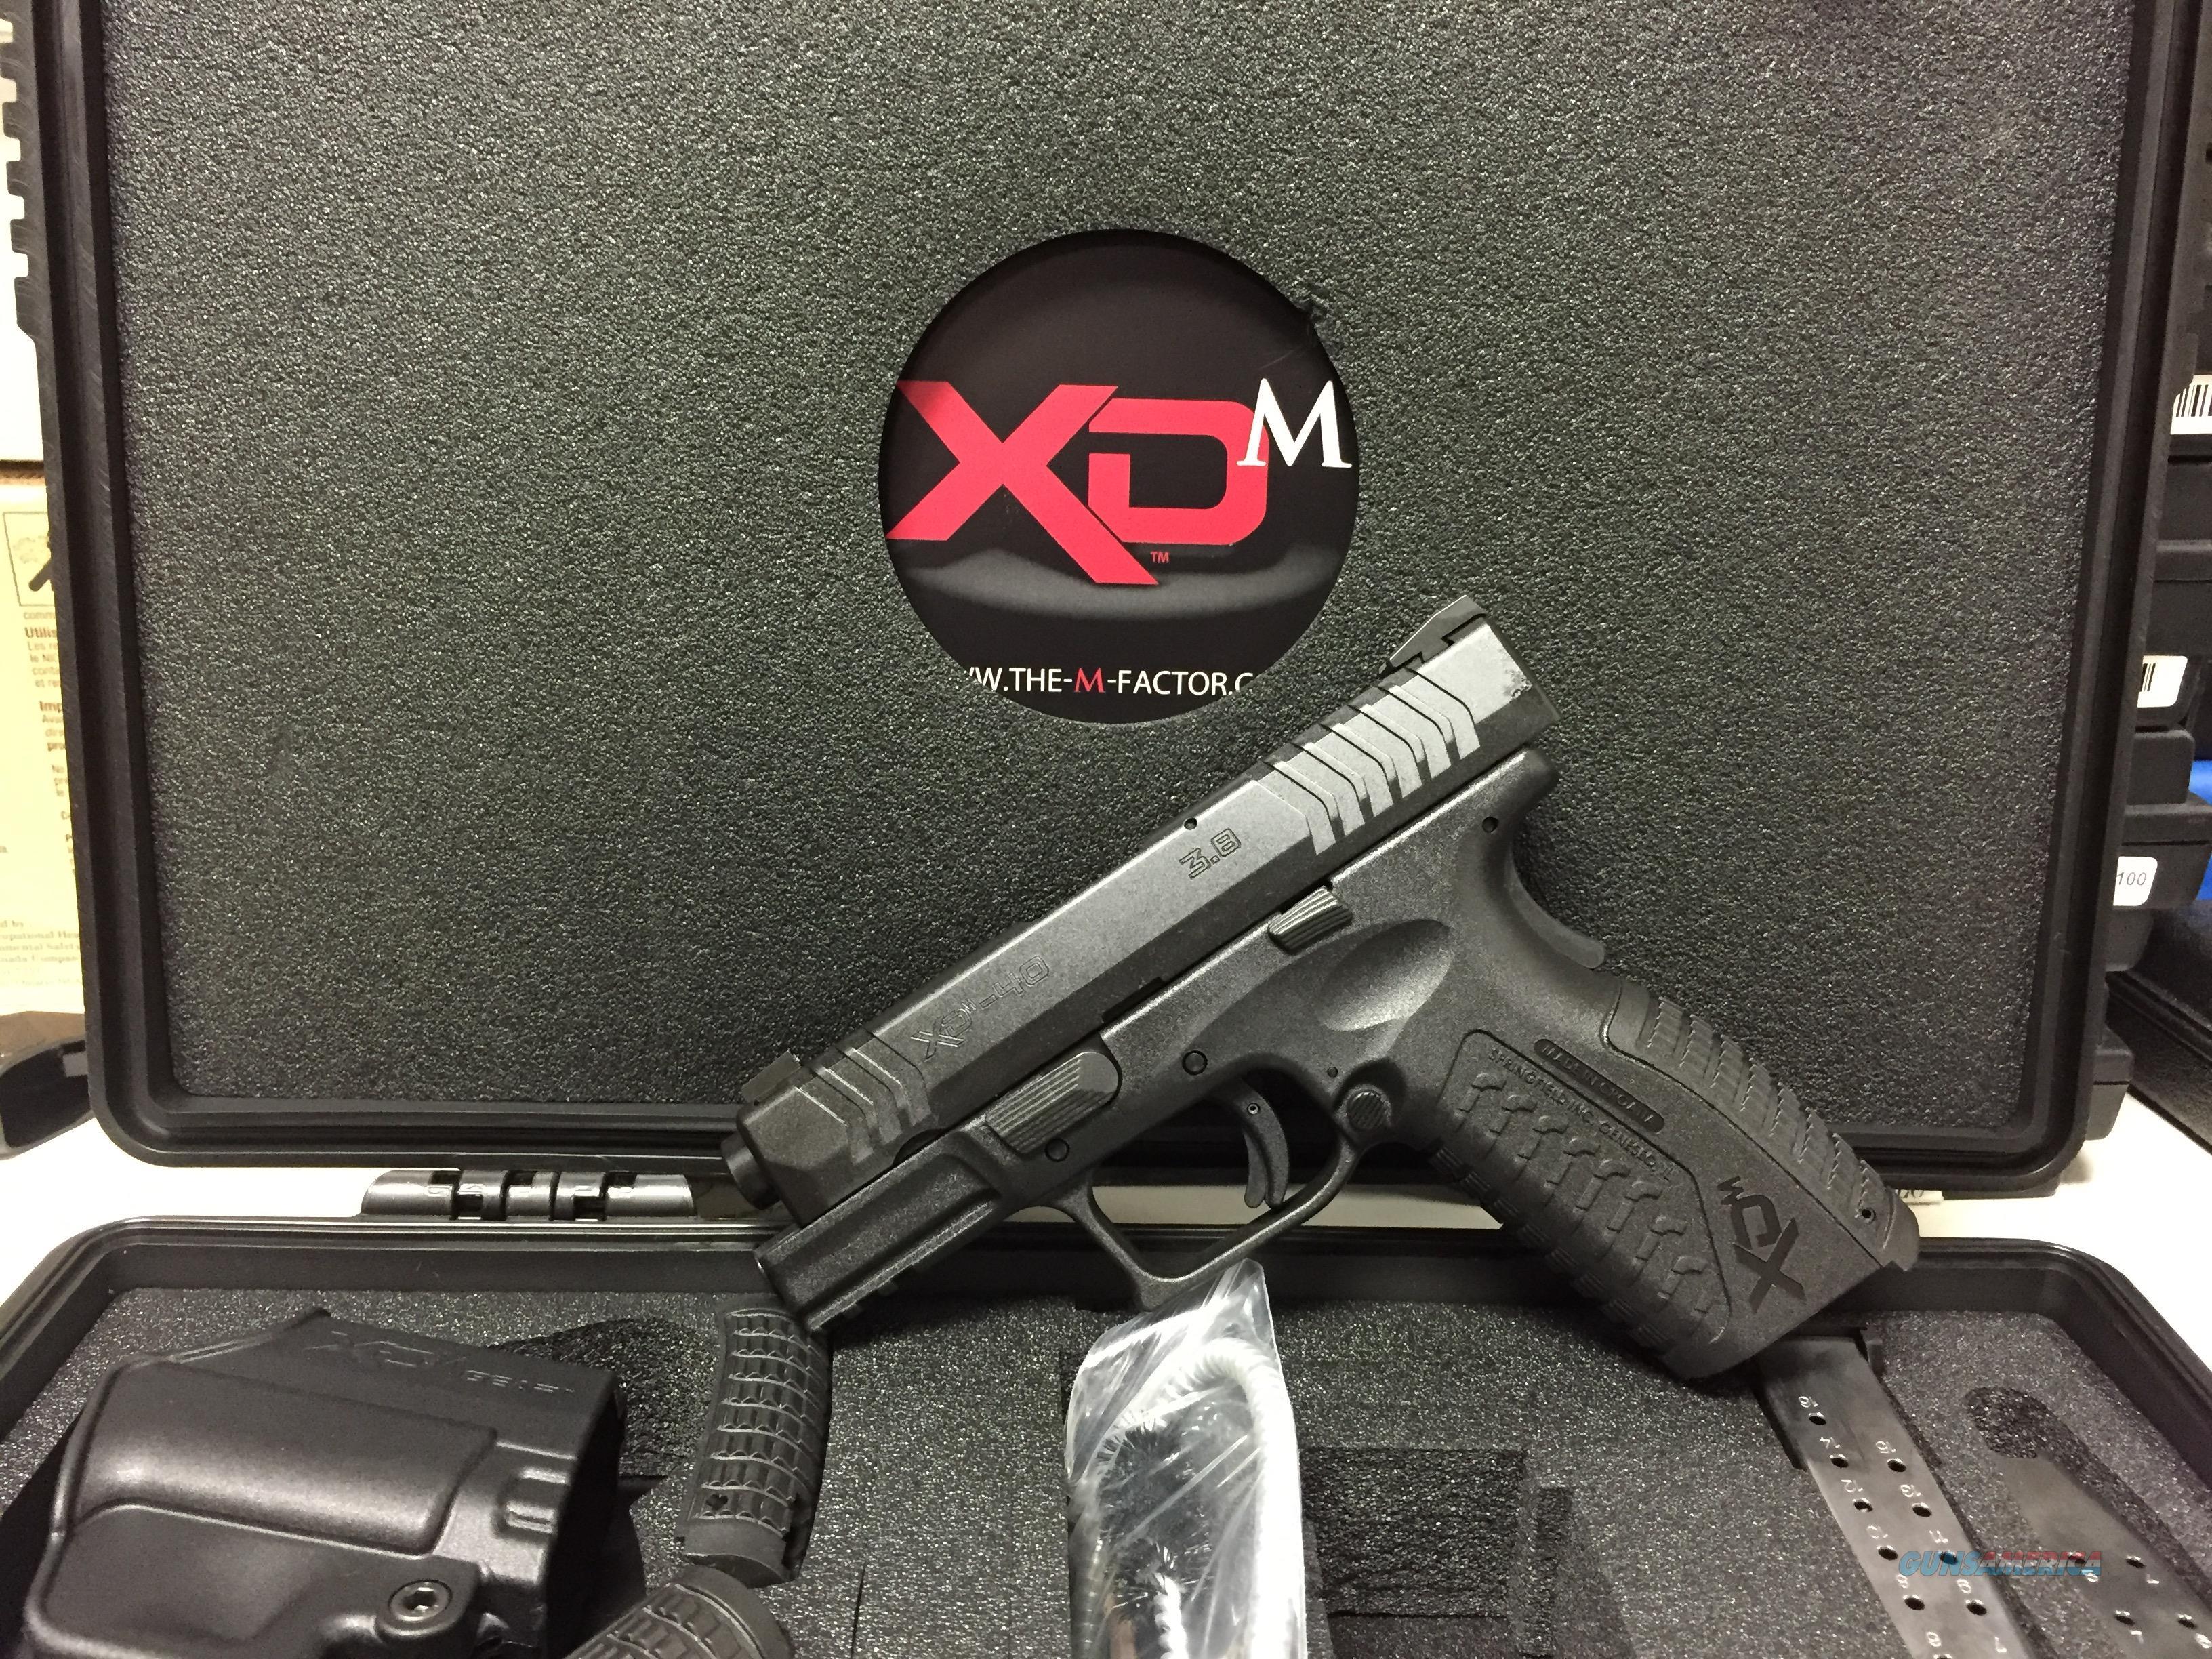 NIB Springfield XDM-40, 40S&W, Night Sights  Guns > Pistols > Springfield Armory Pistols > XD-M